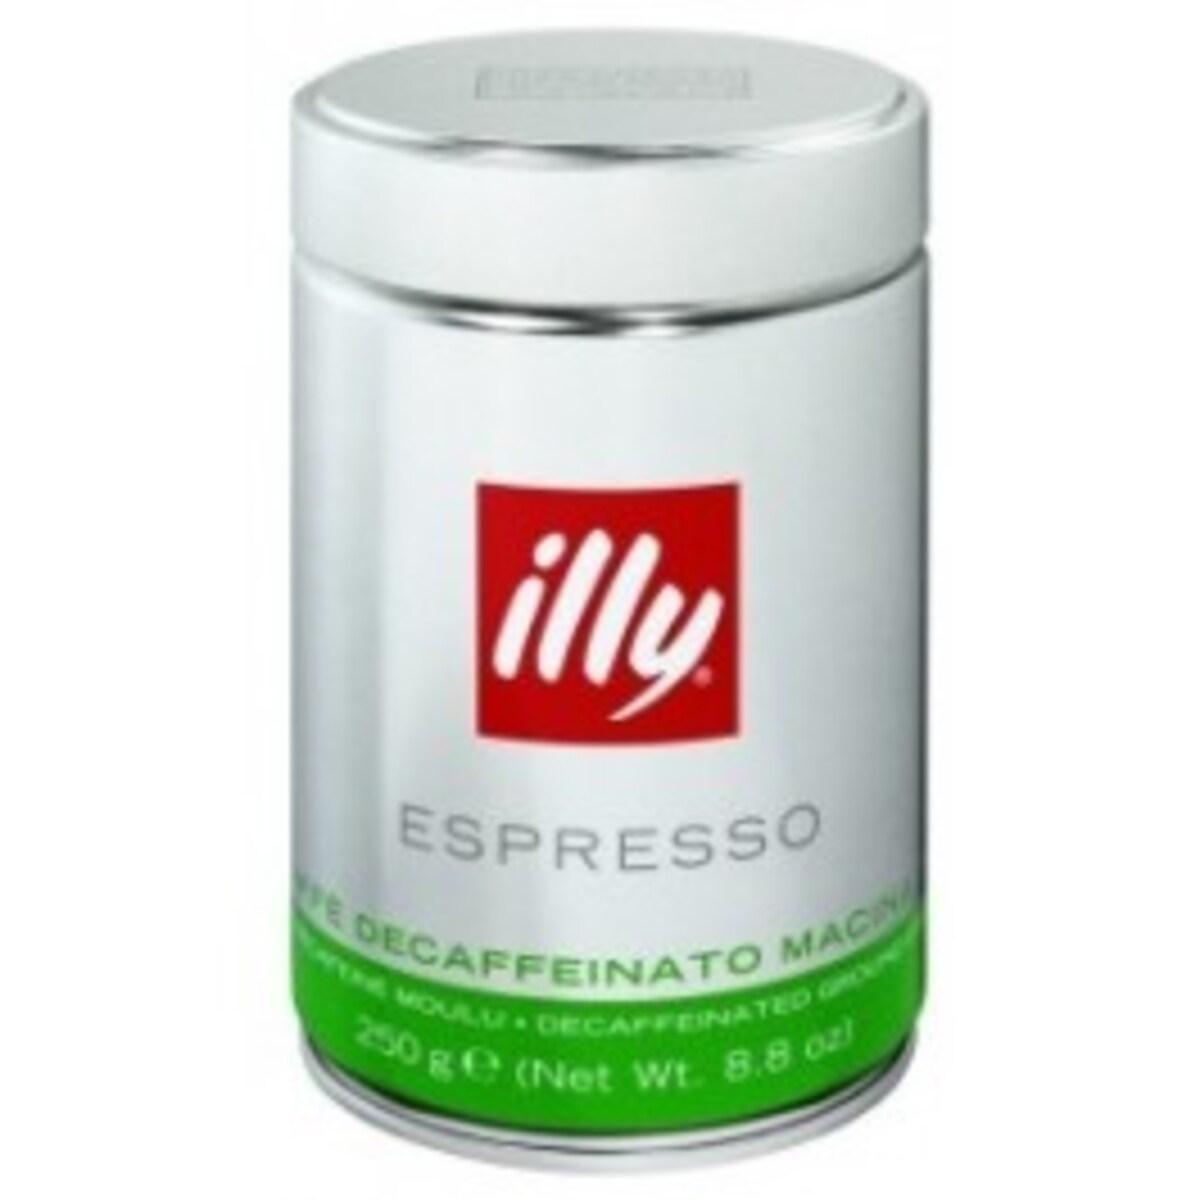 illy Espresso Decaffeinato - мляно кафе 250 гр.